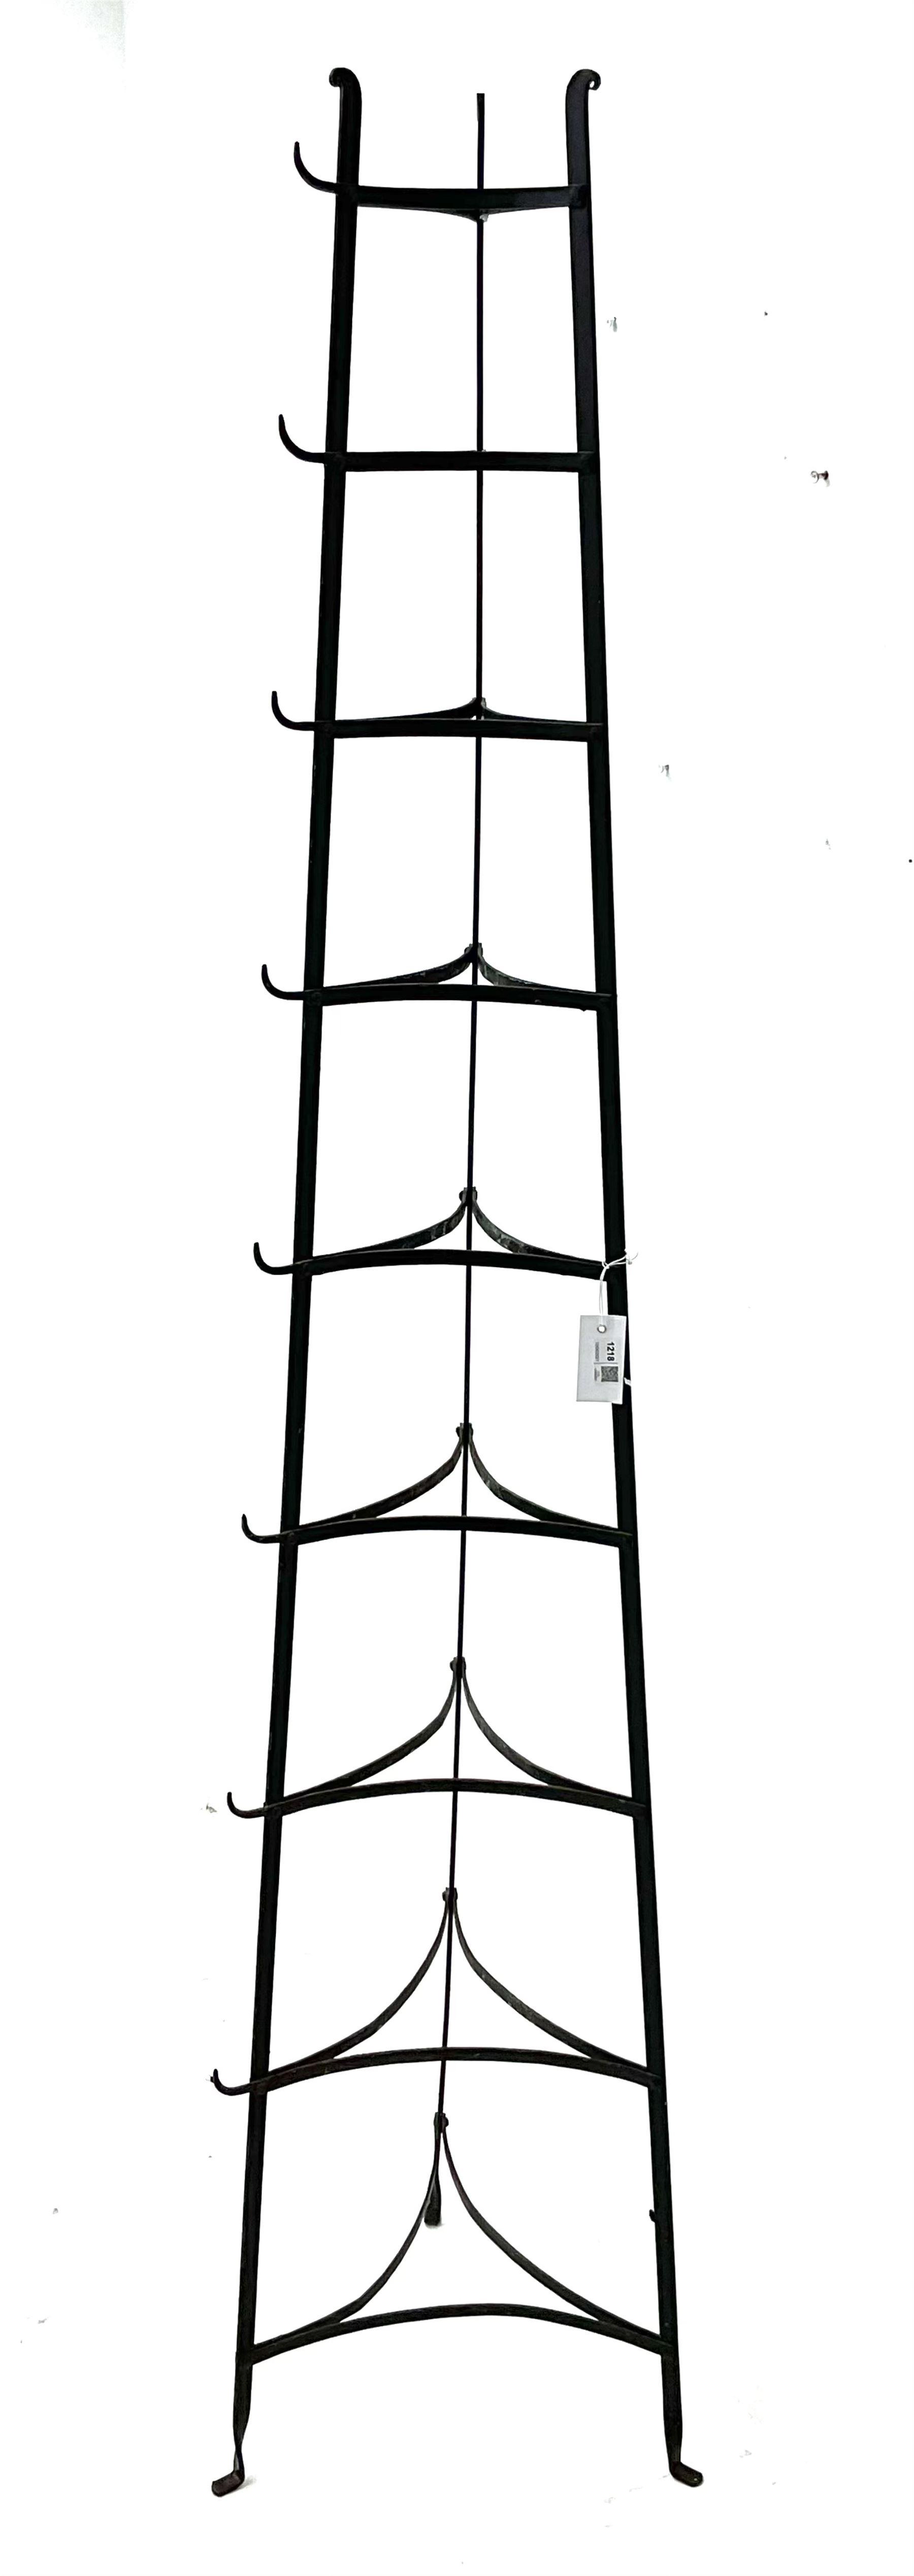 20th century black painted metal nine tier pan stand - Image 2 of 2